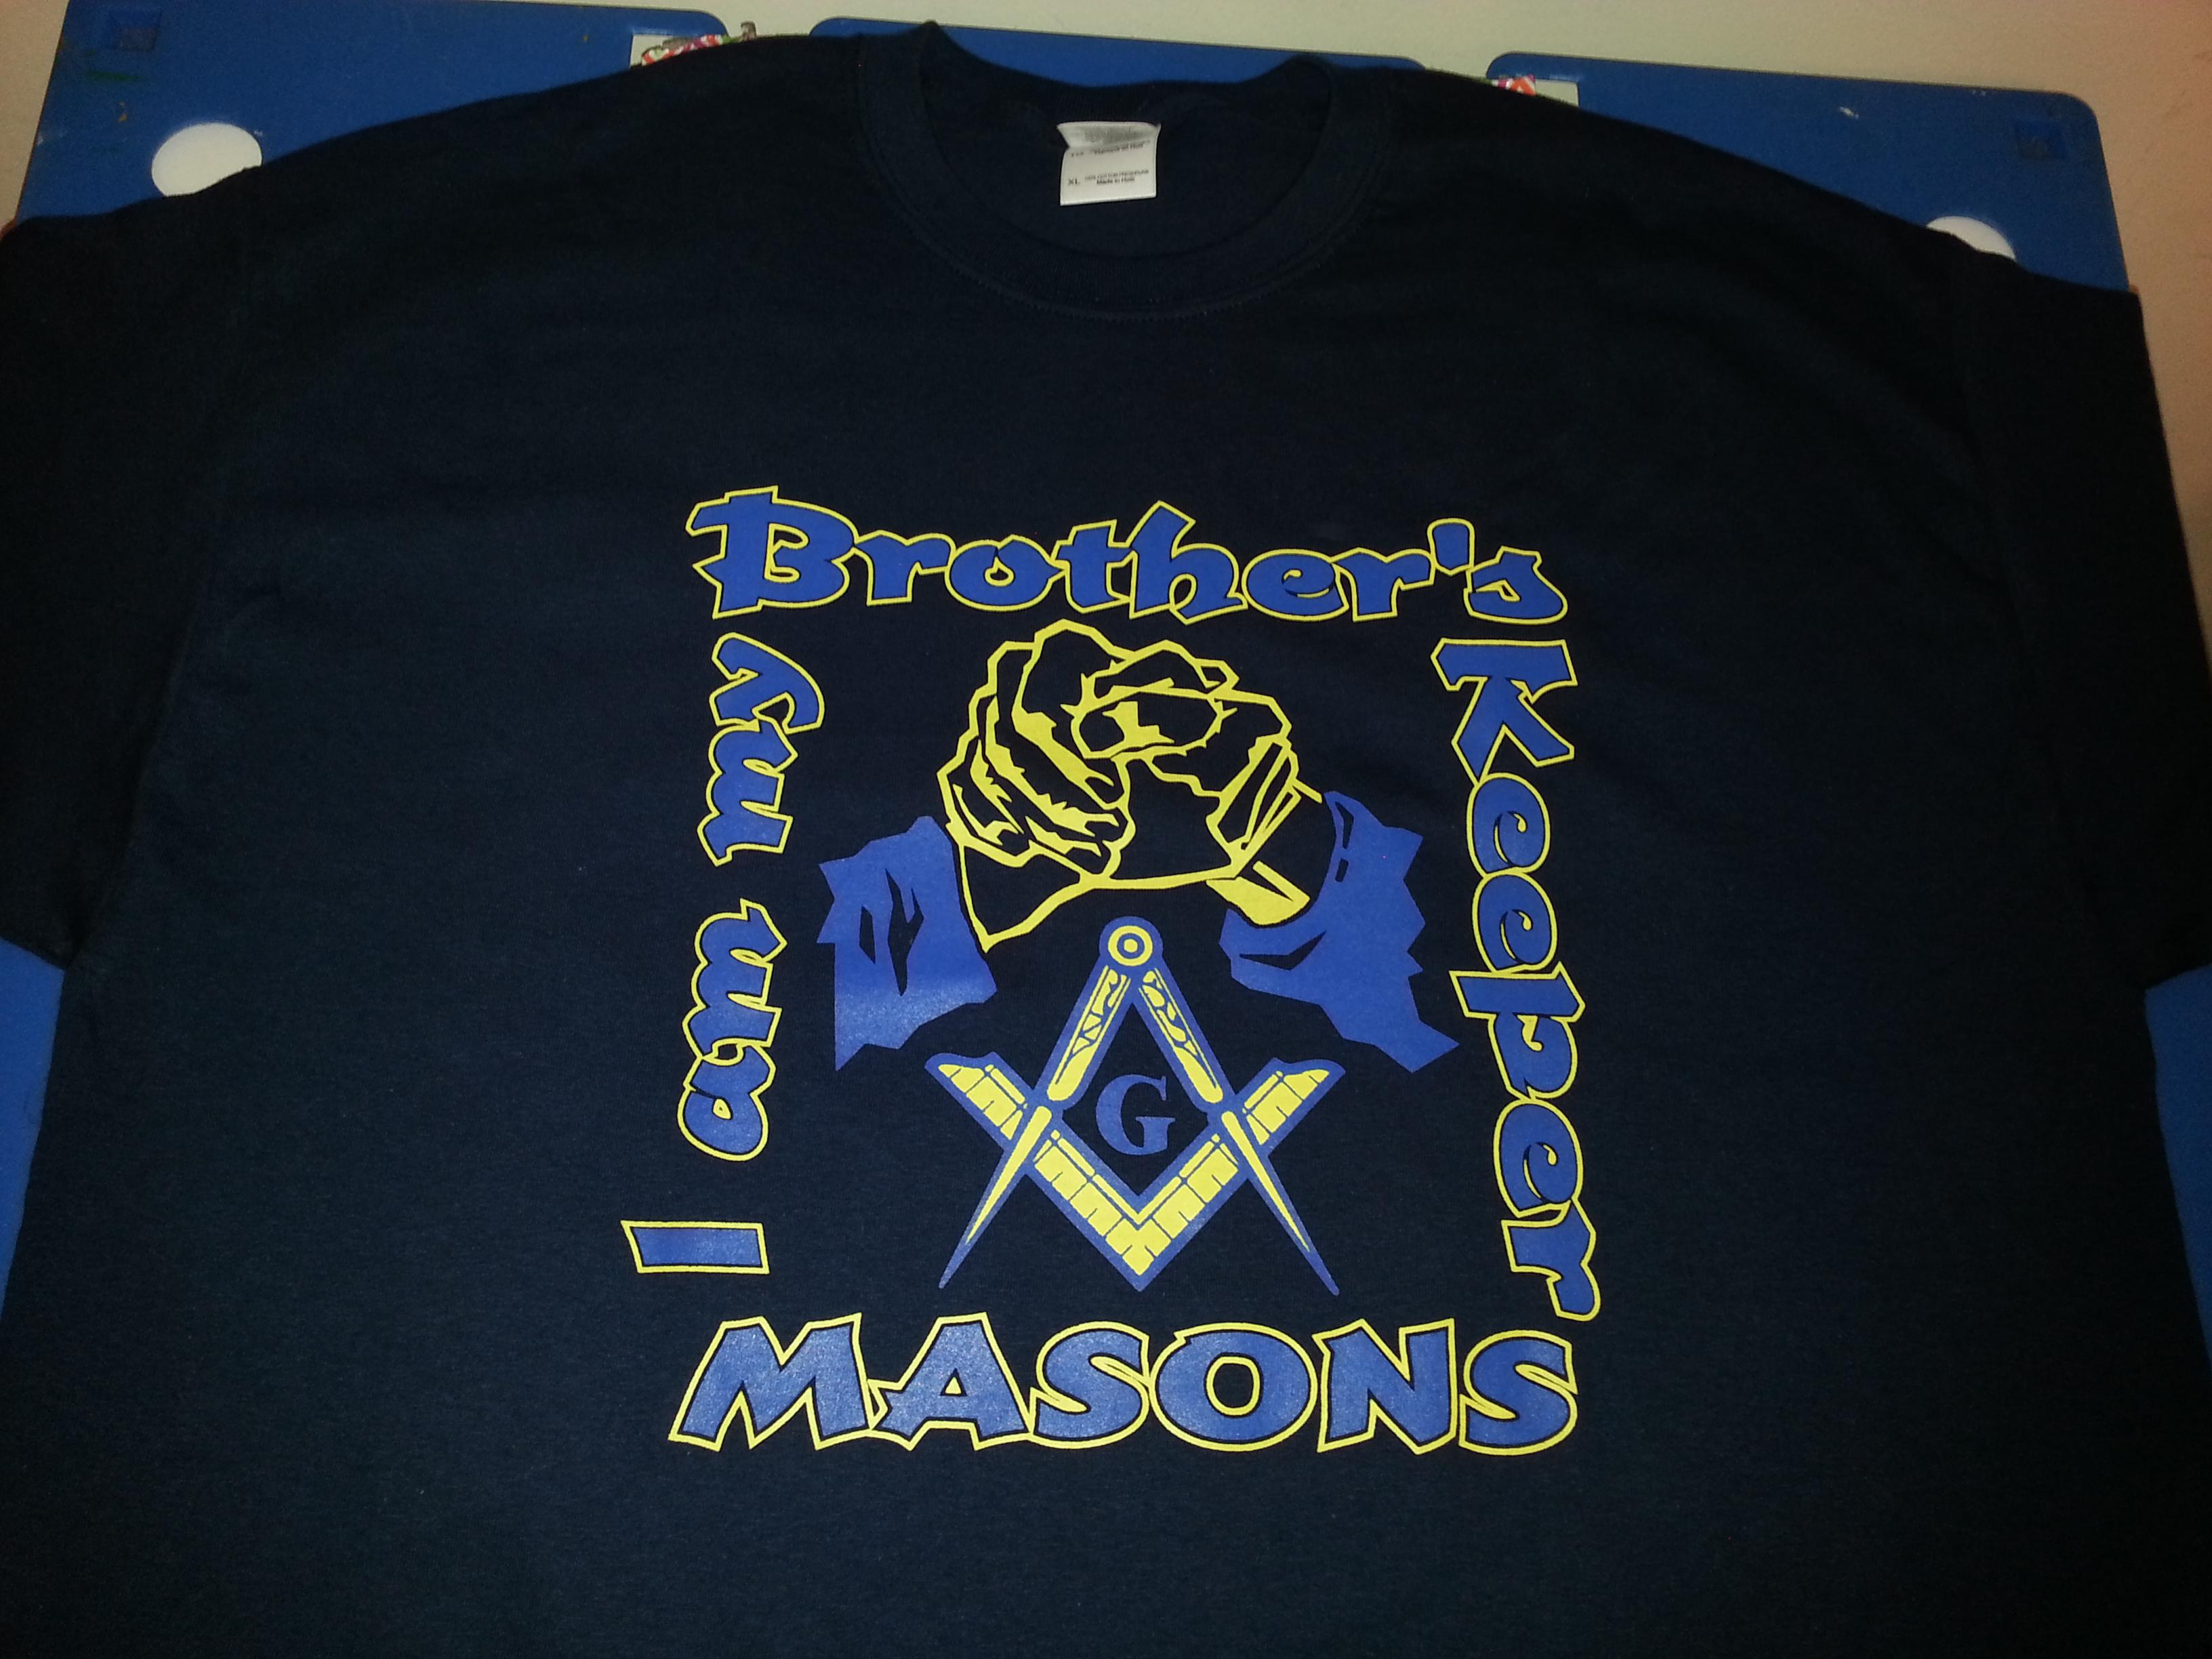 Masonic i am my brothers keeper navy t for Mason s men s shirts